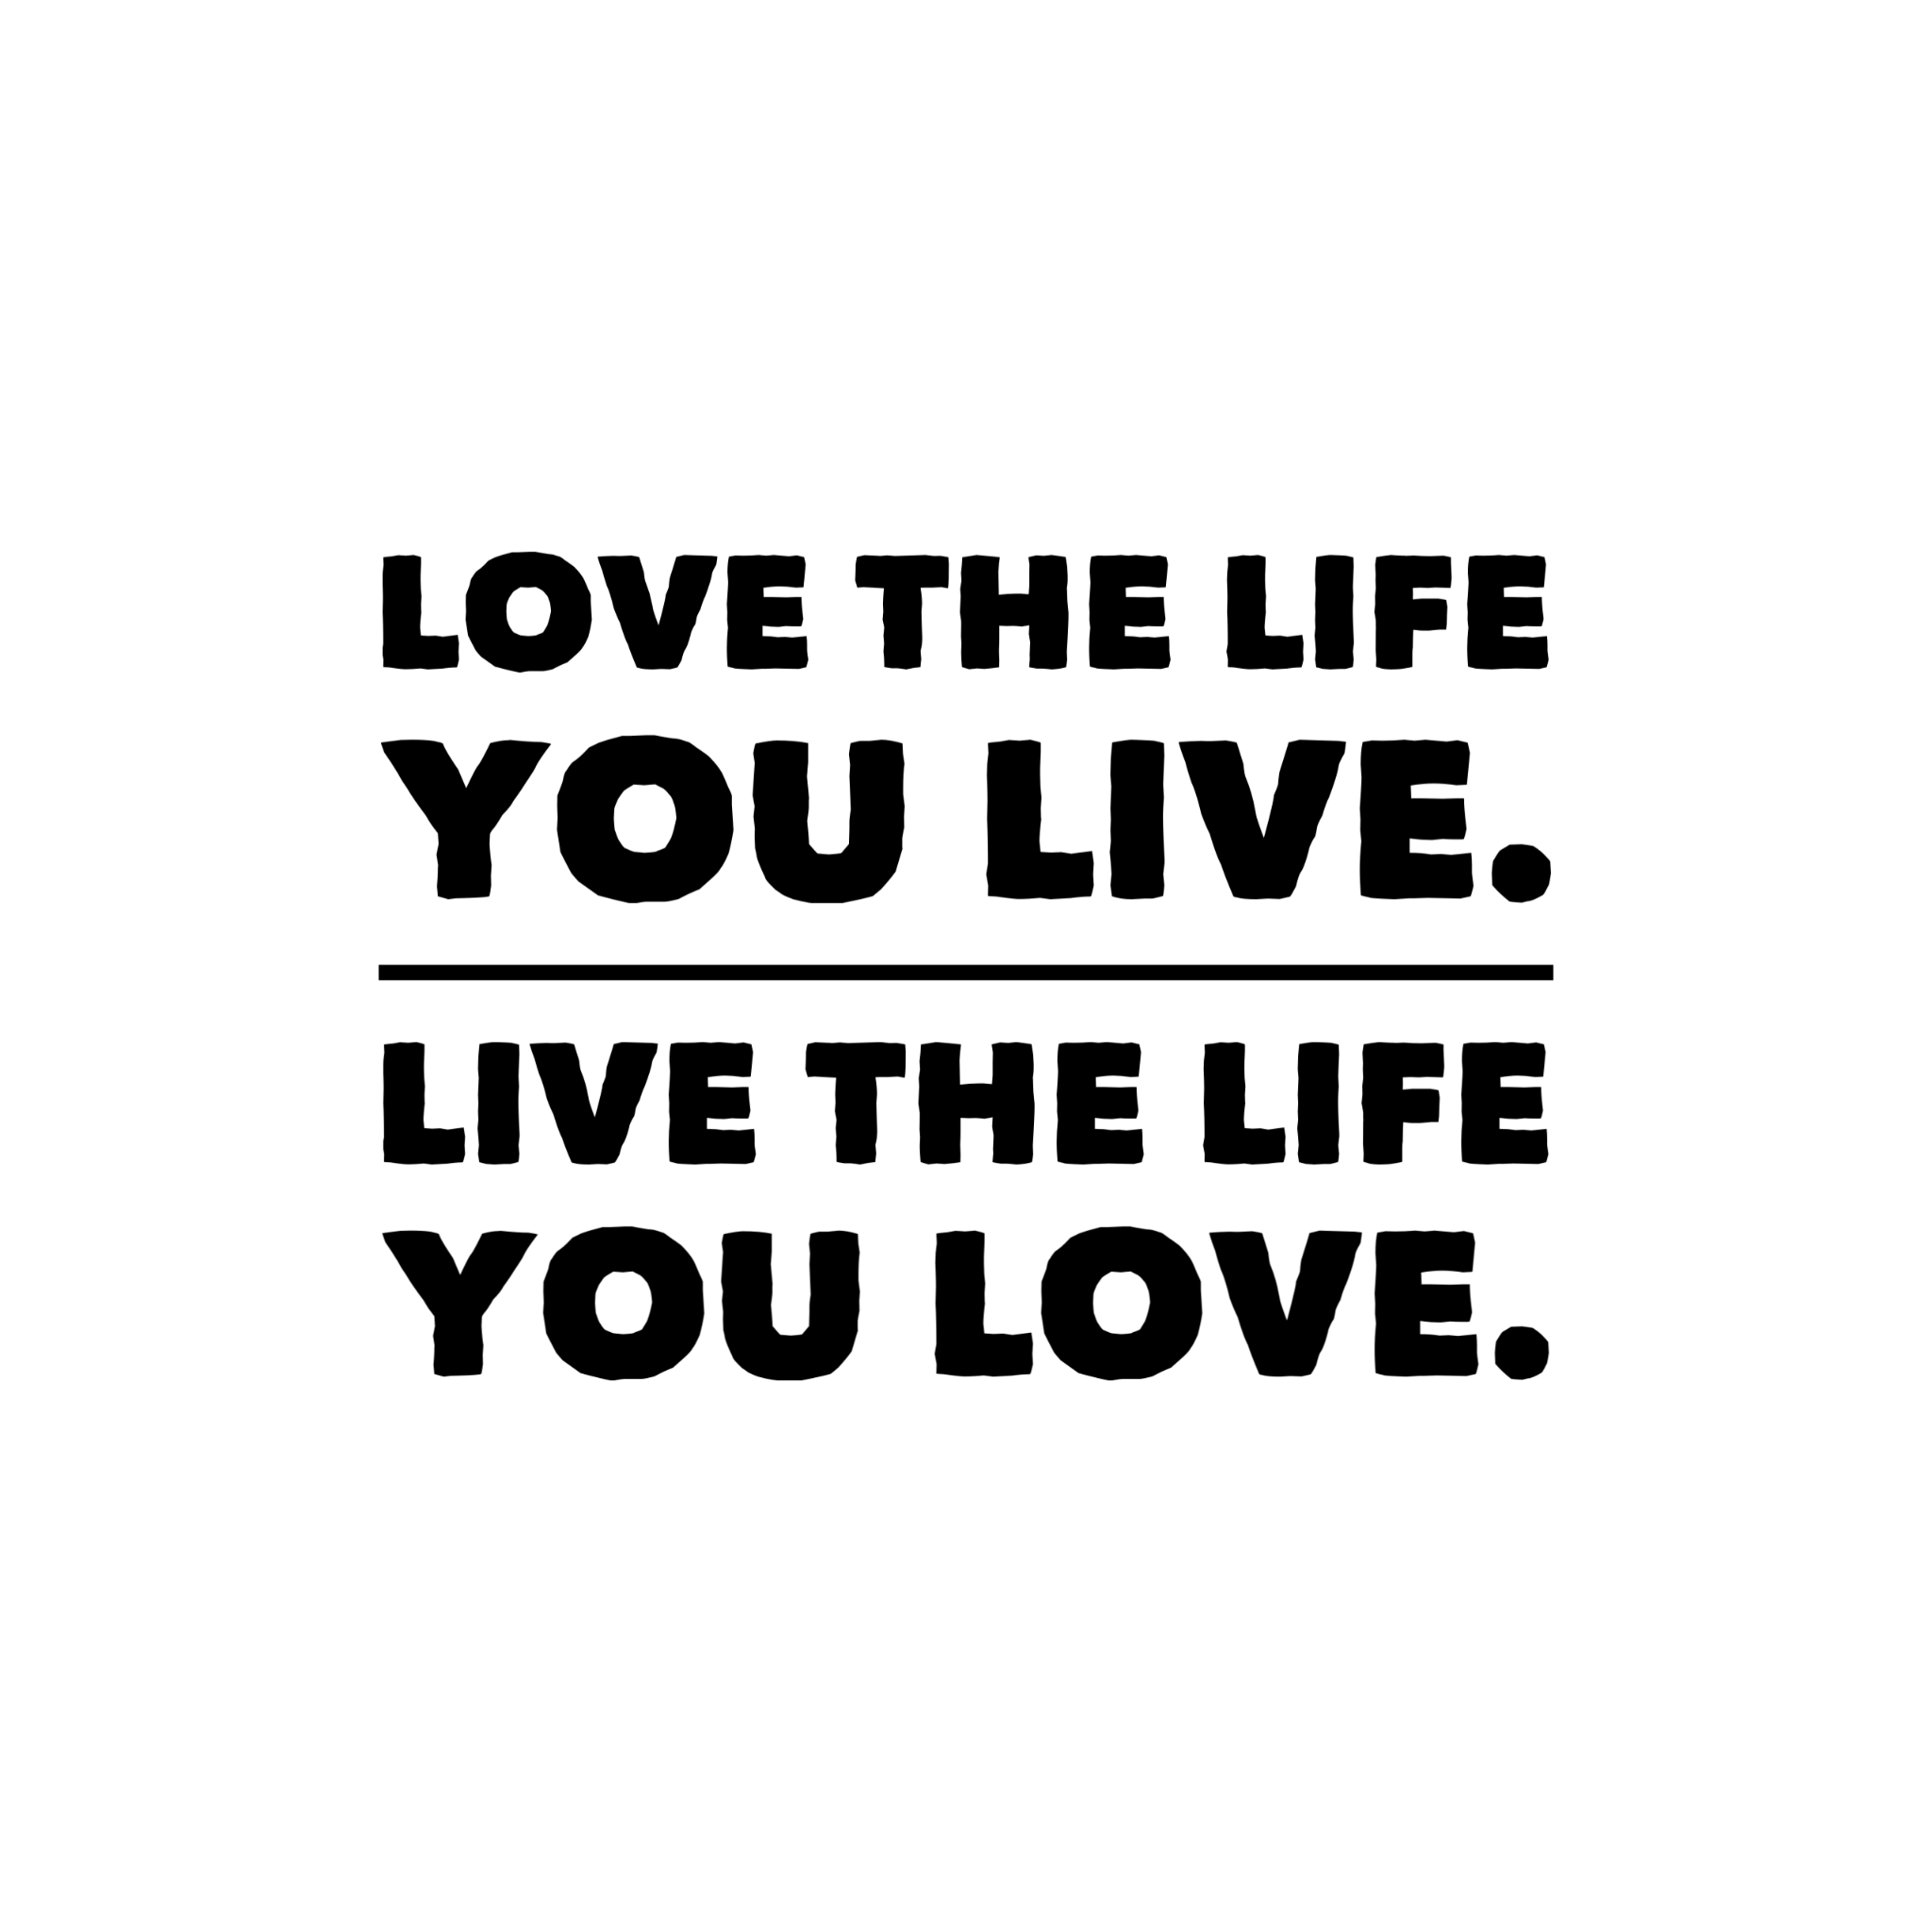 mitsuqの画像